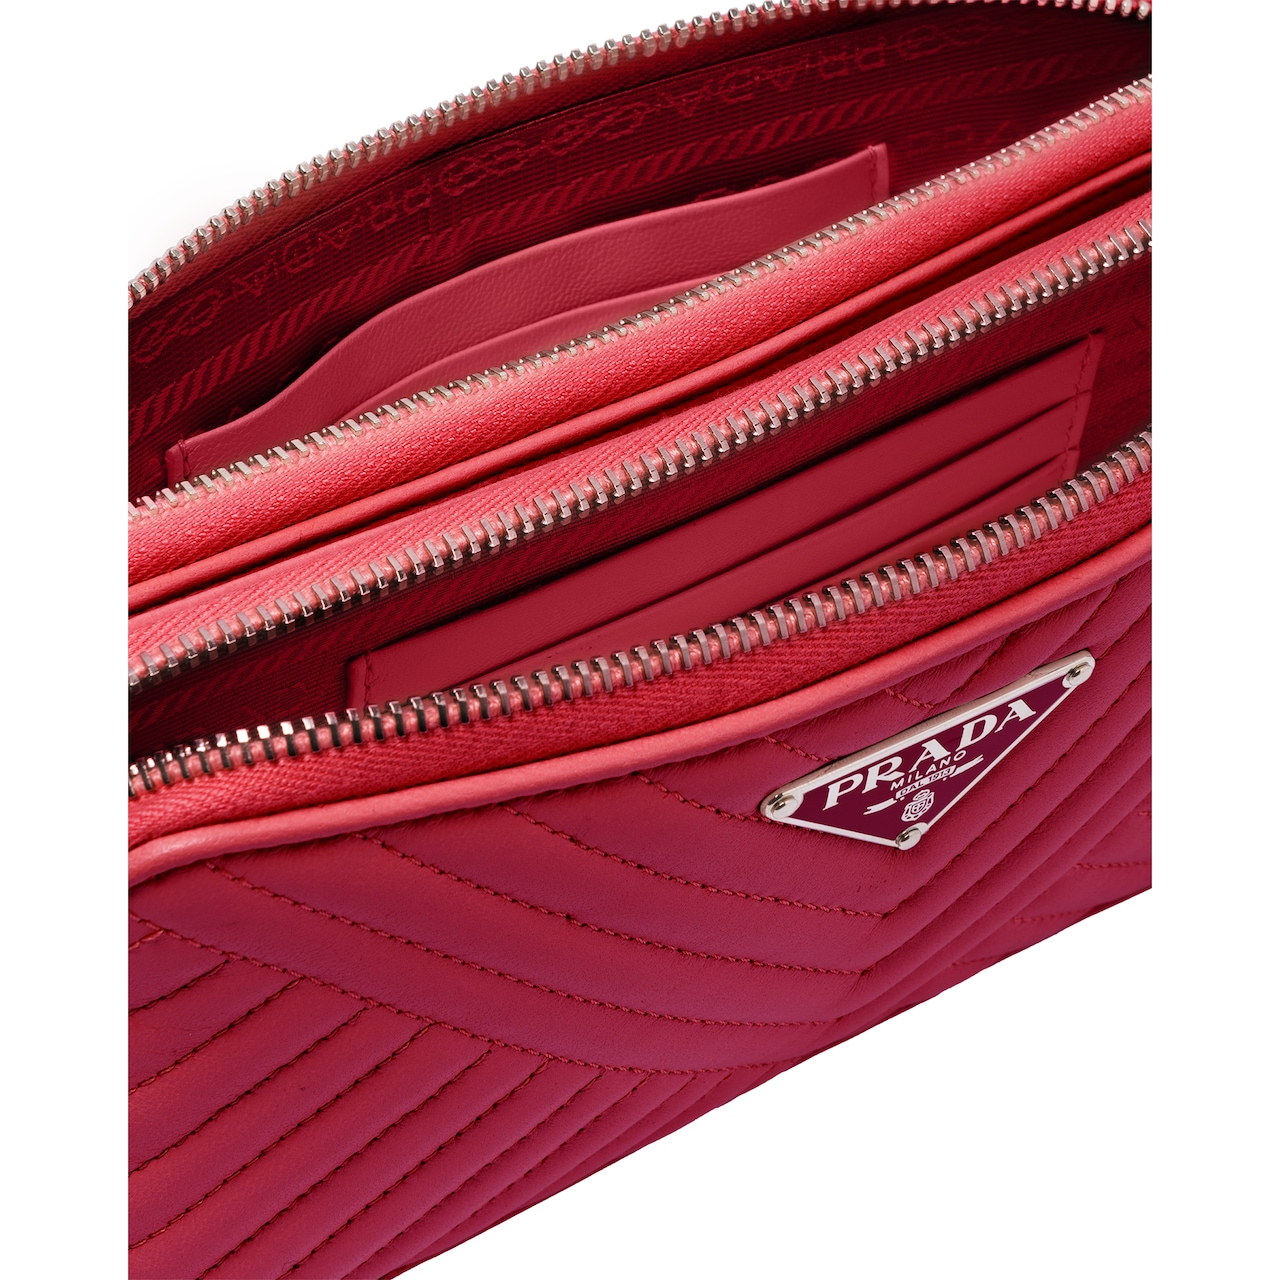 Prada Nappa leather mini shoulder bag 5